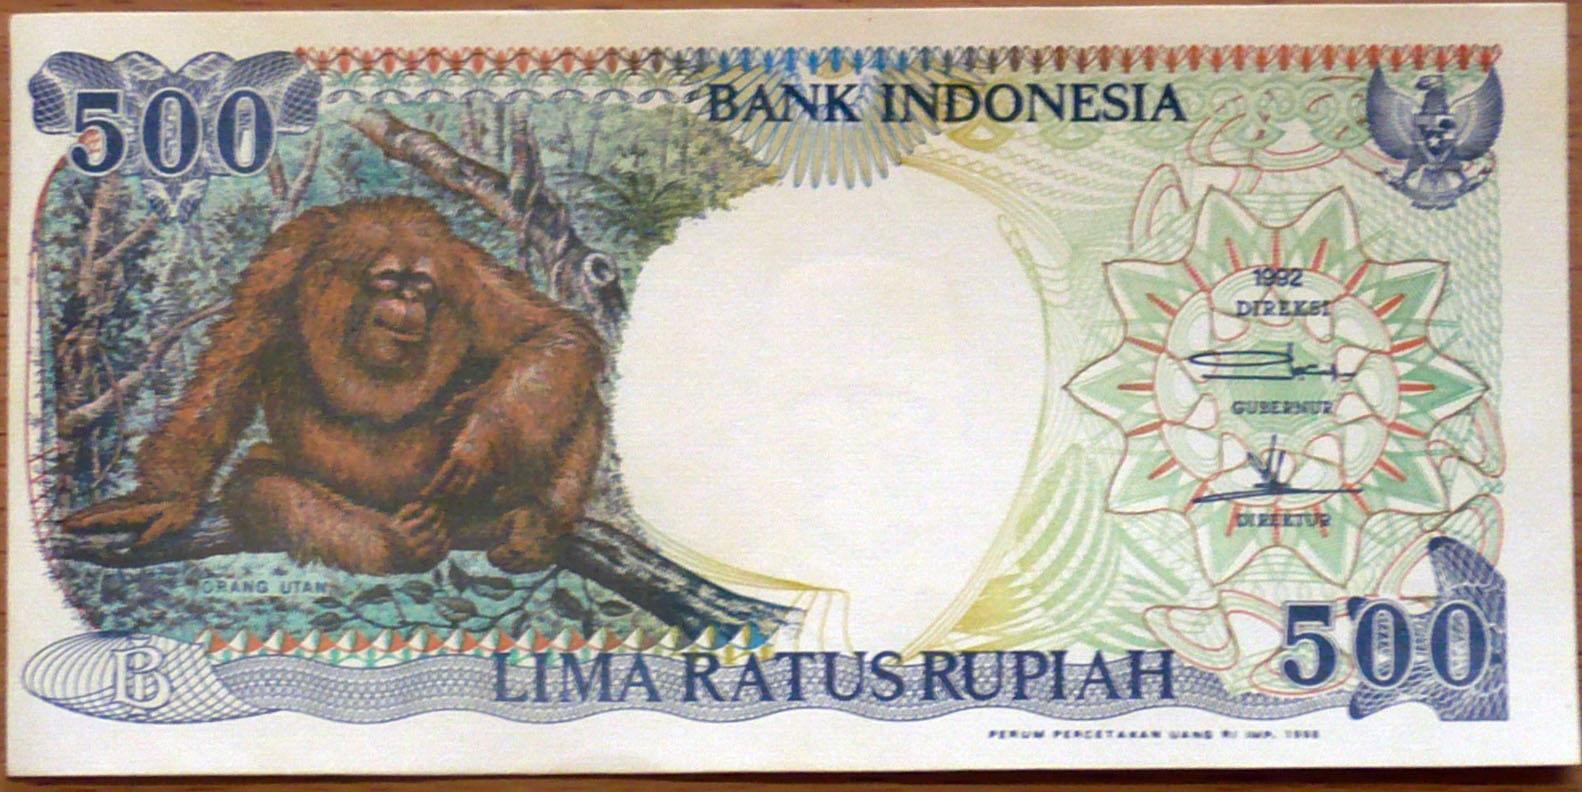 Dulu jadi guyonan masa kecil, uangnya sekarang bernilai 10 kali lipat!